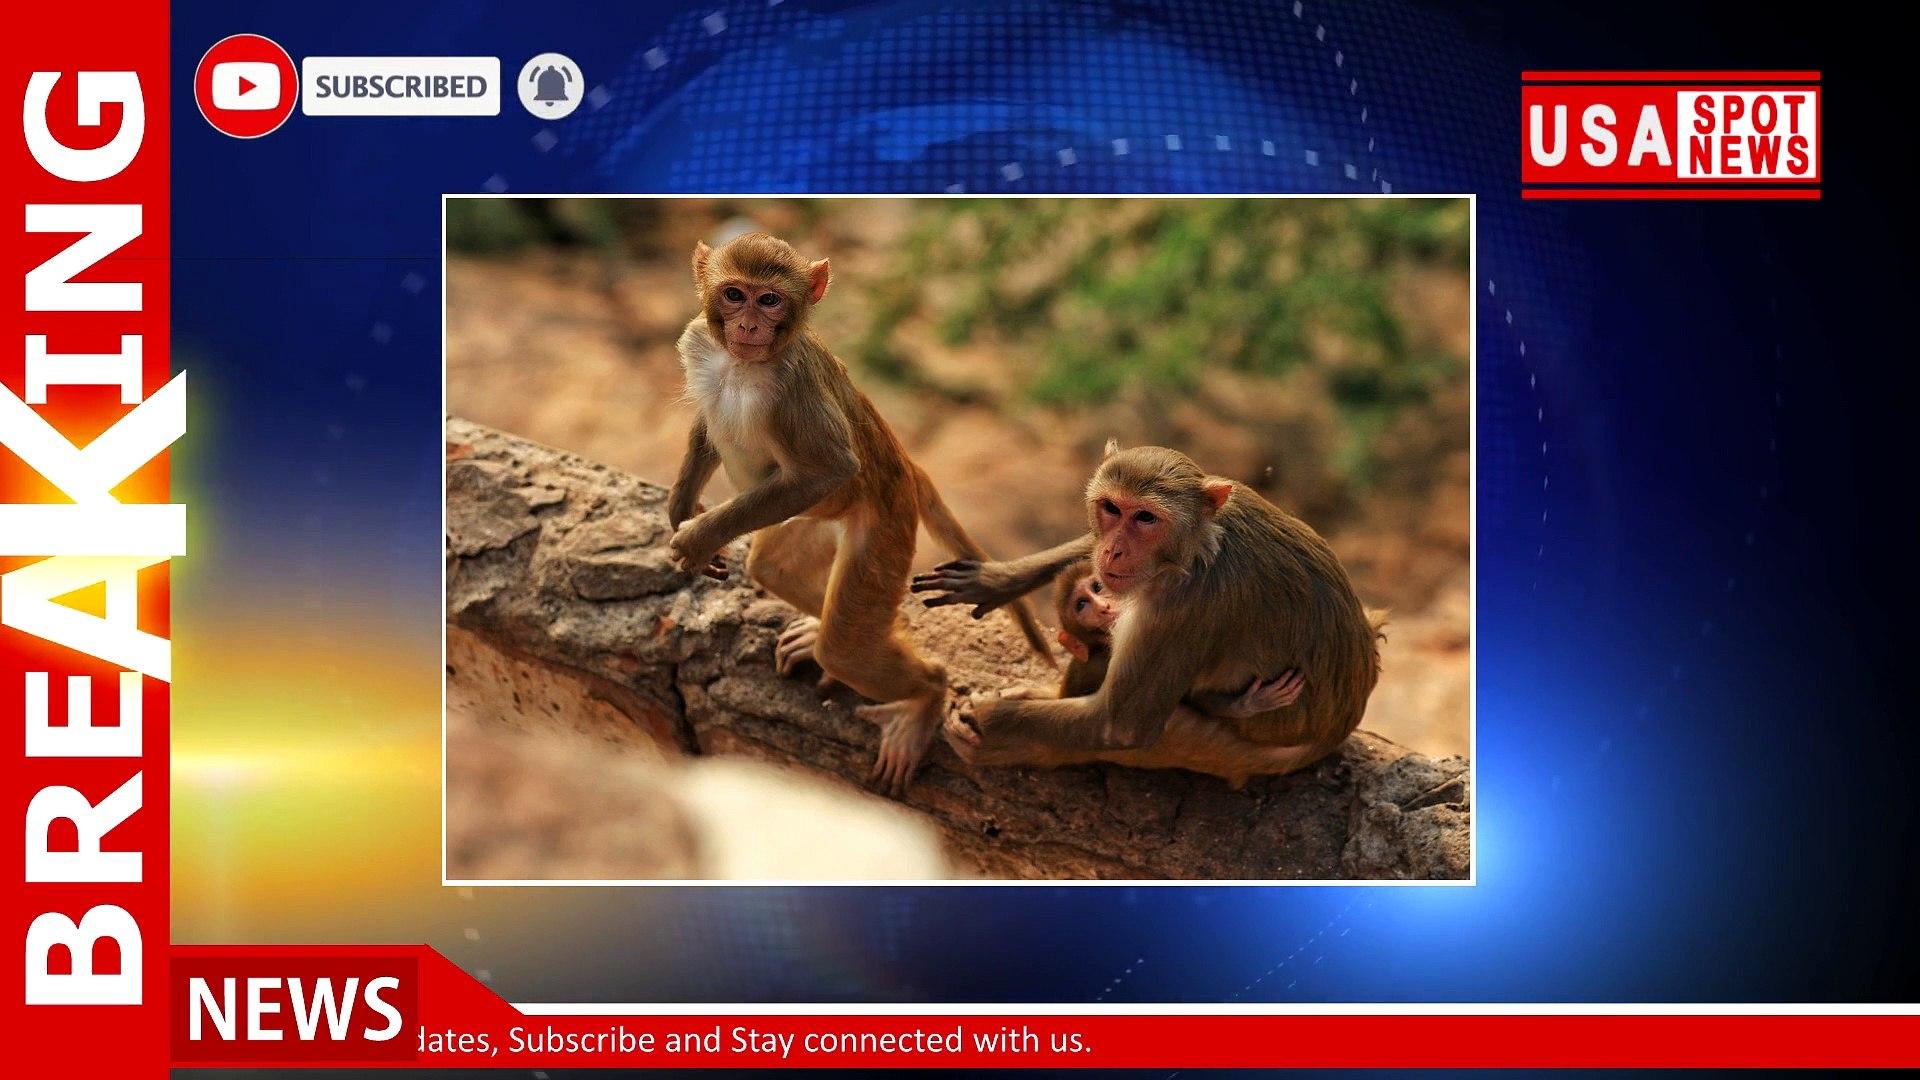 15 Feb 2021 | Morning News Headlines | Breaking News | News Today | USA Spot News